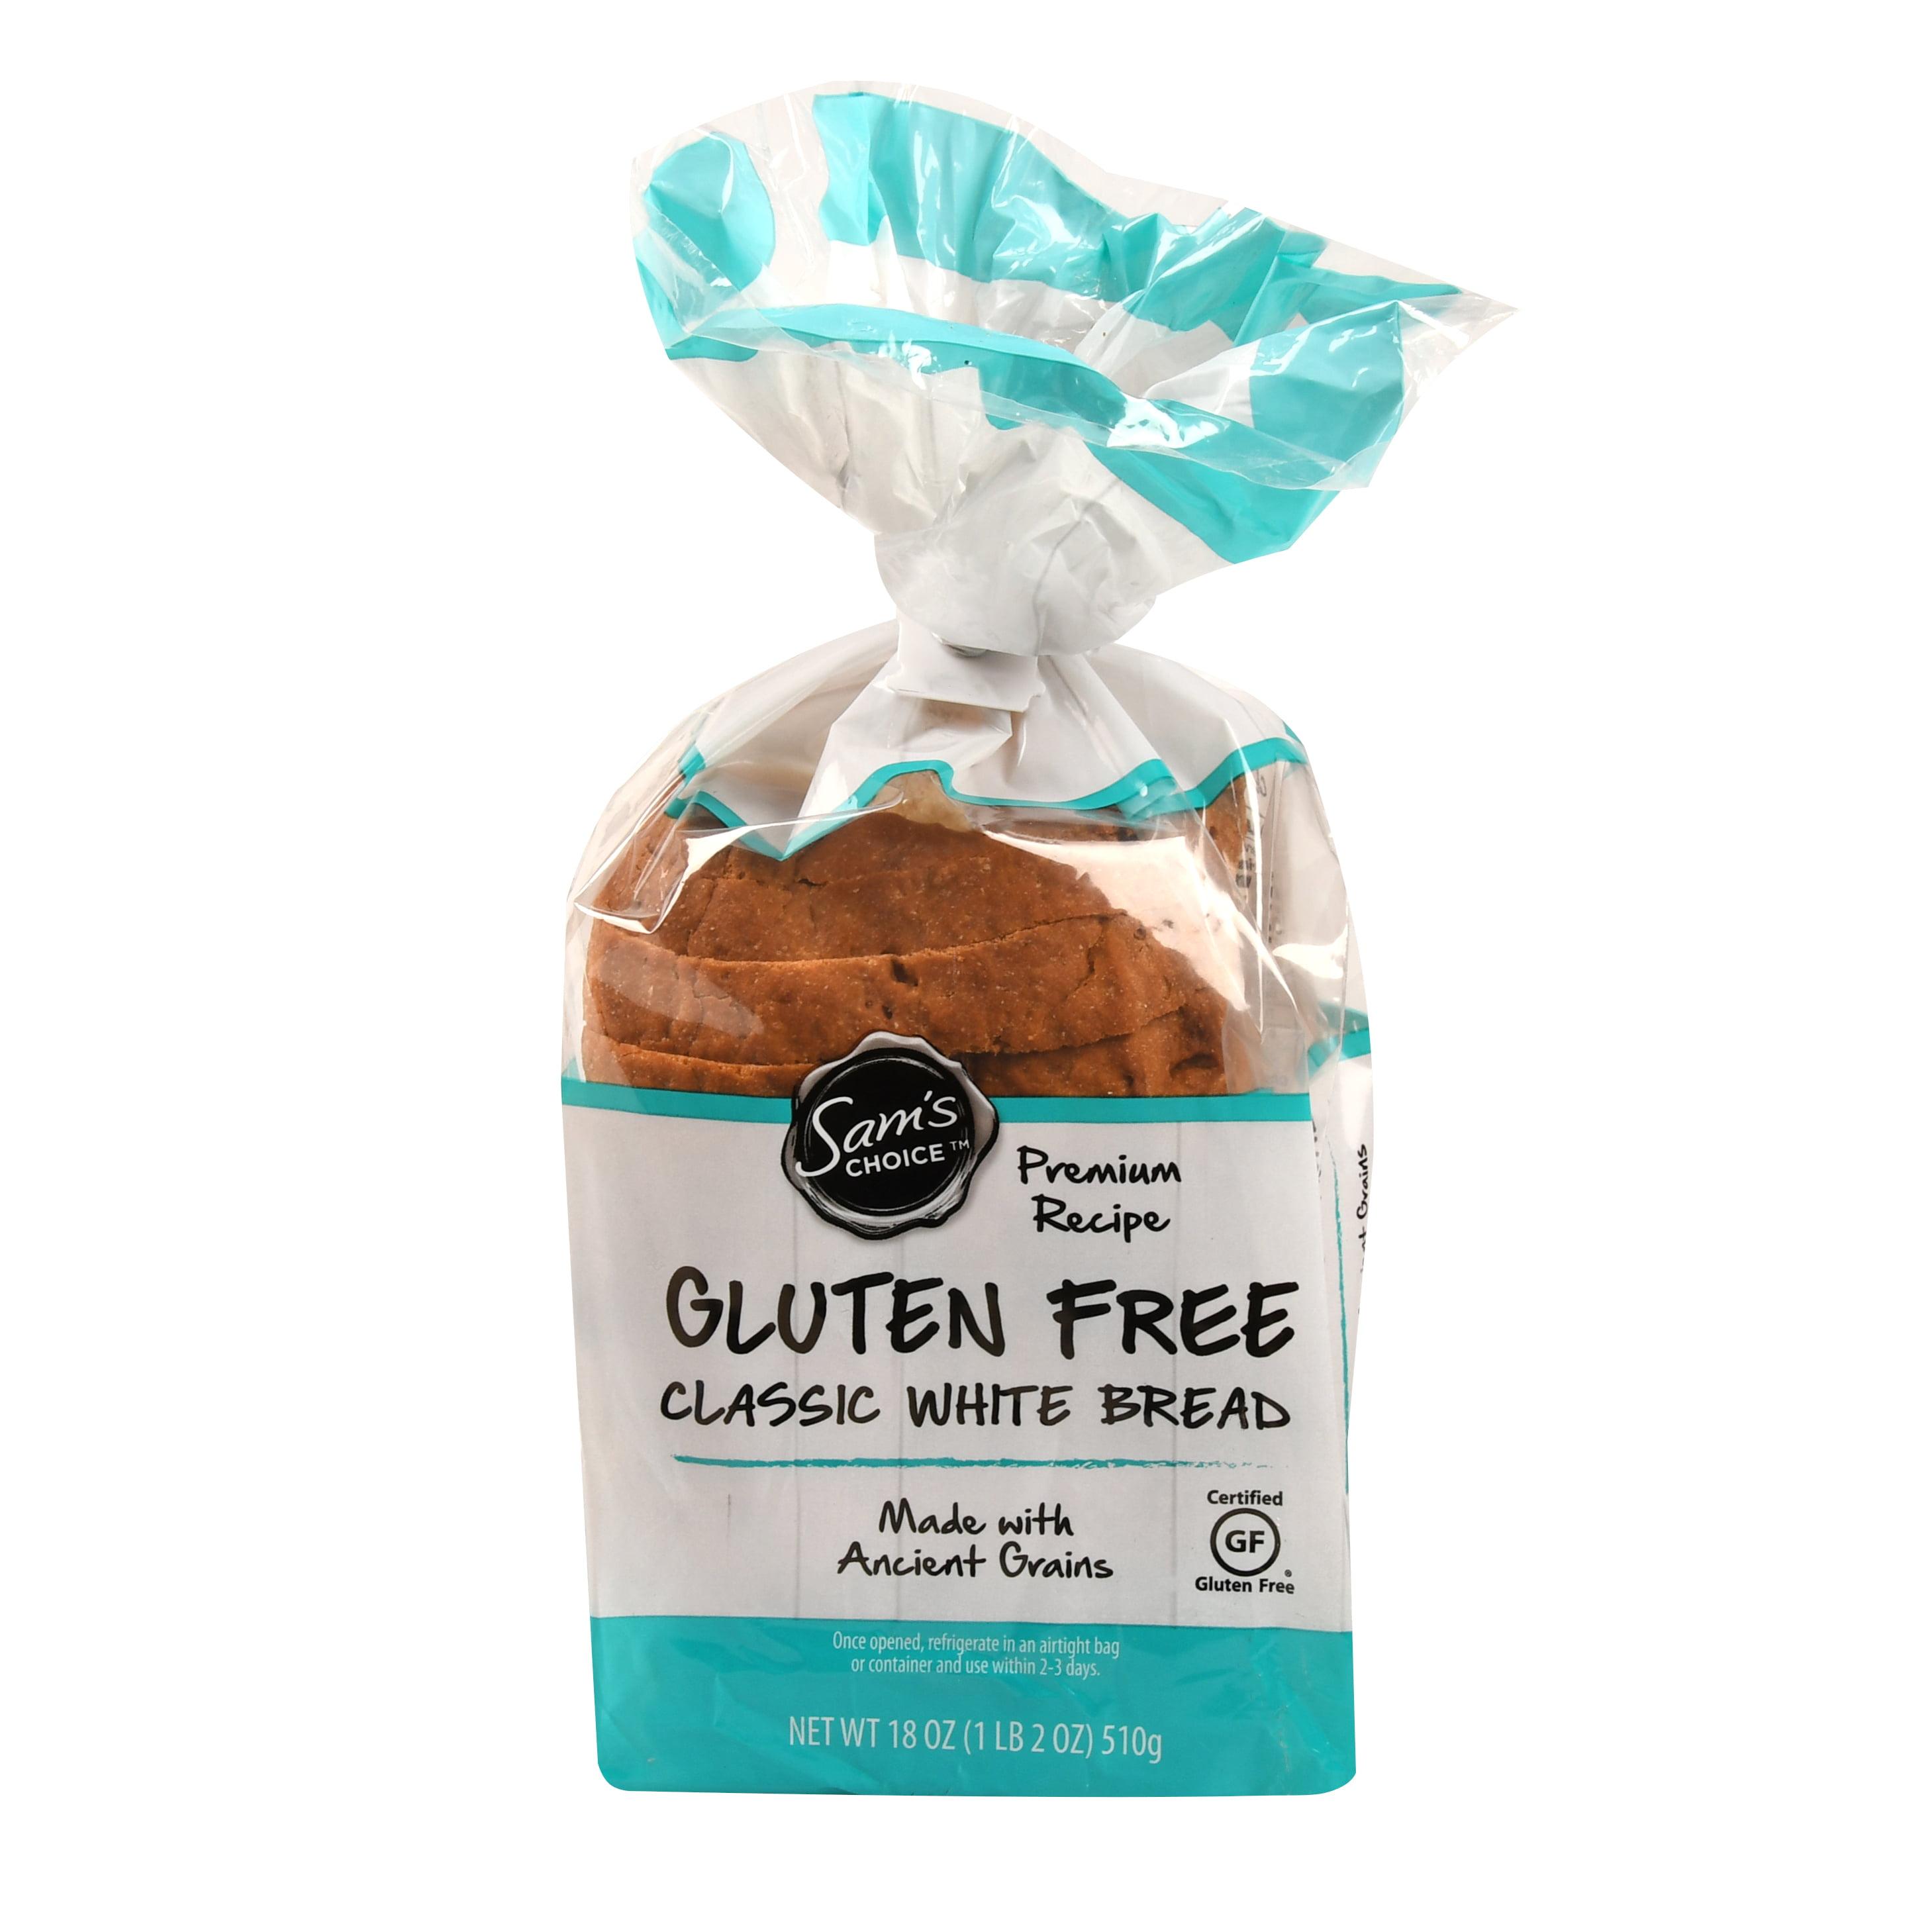 Sams Choice Gluten Free Classic White Bread 18 Oz